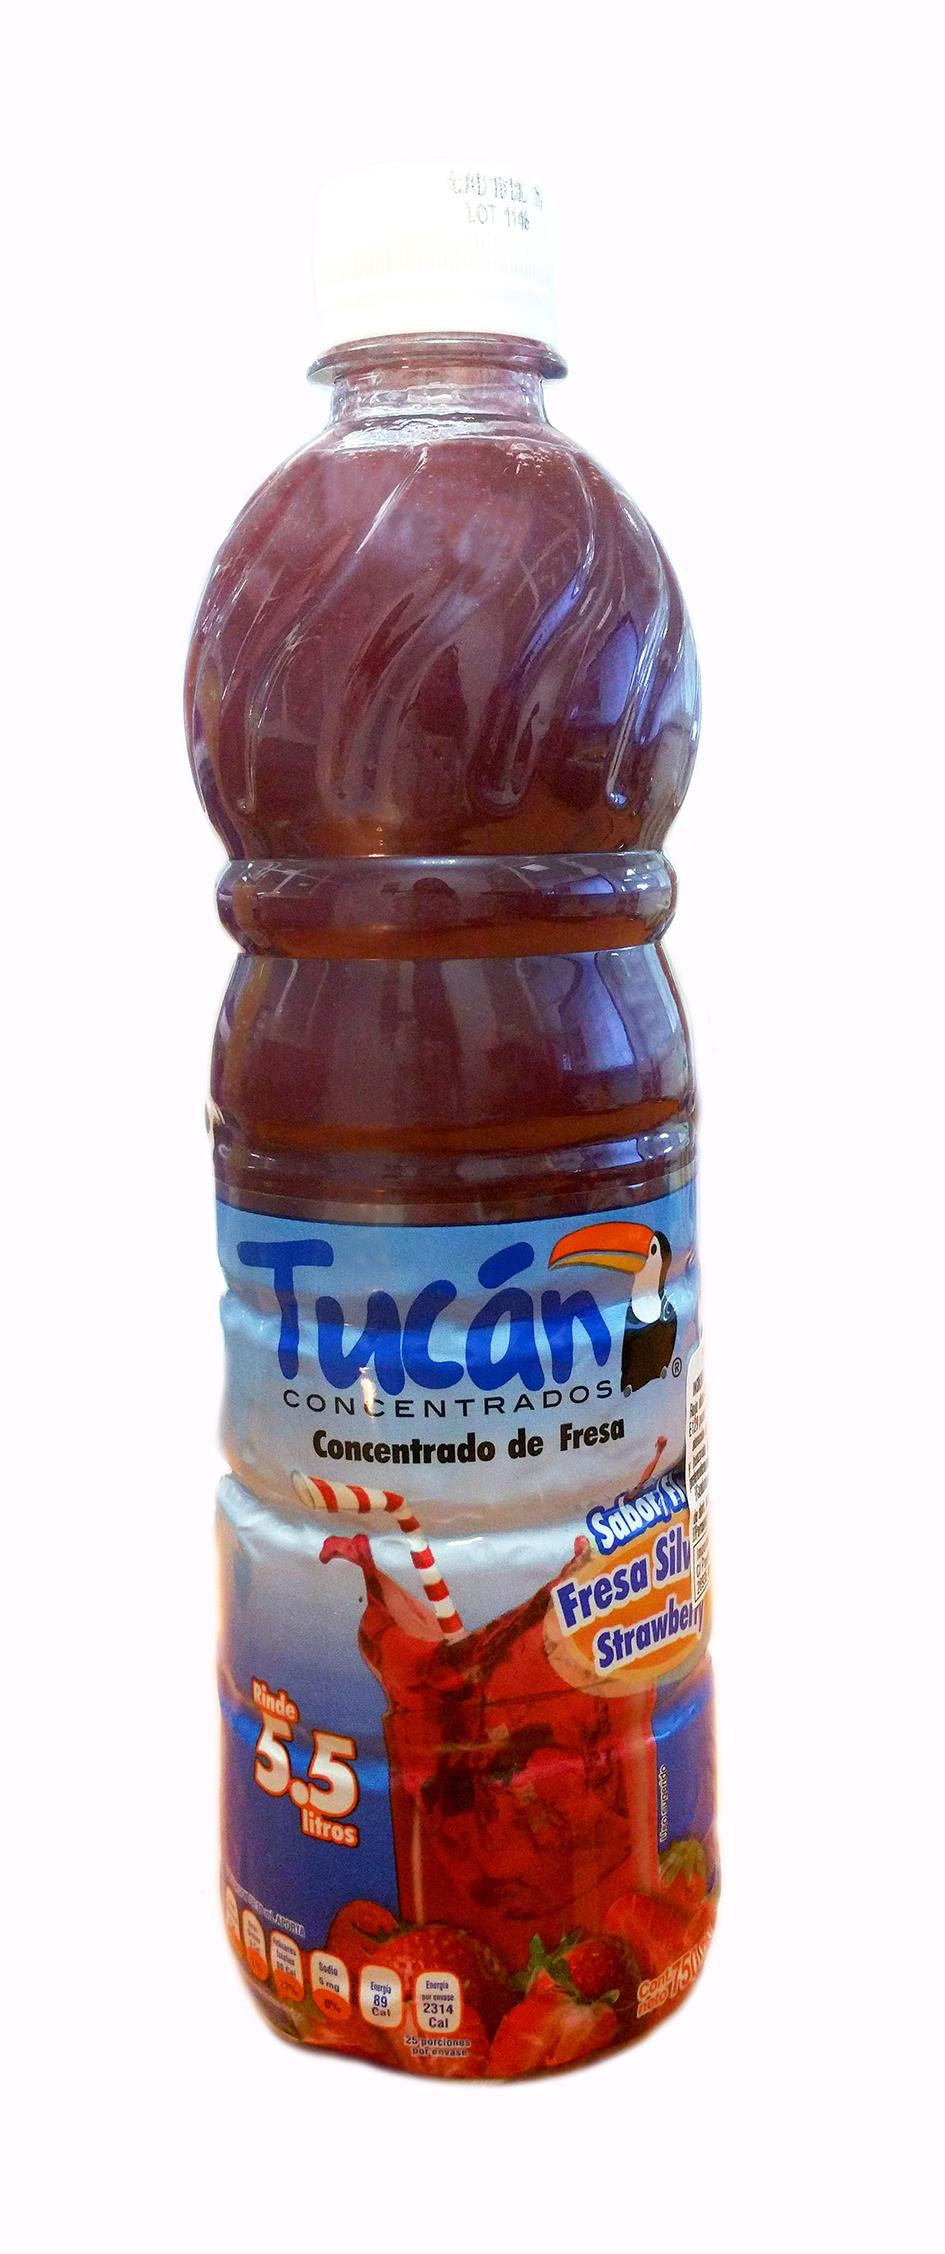 Concentrado de agua de Fresa Tucan 750ml Botella Plástico